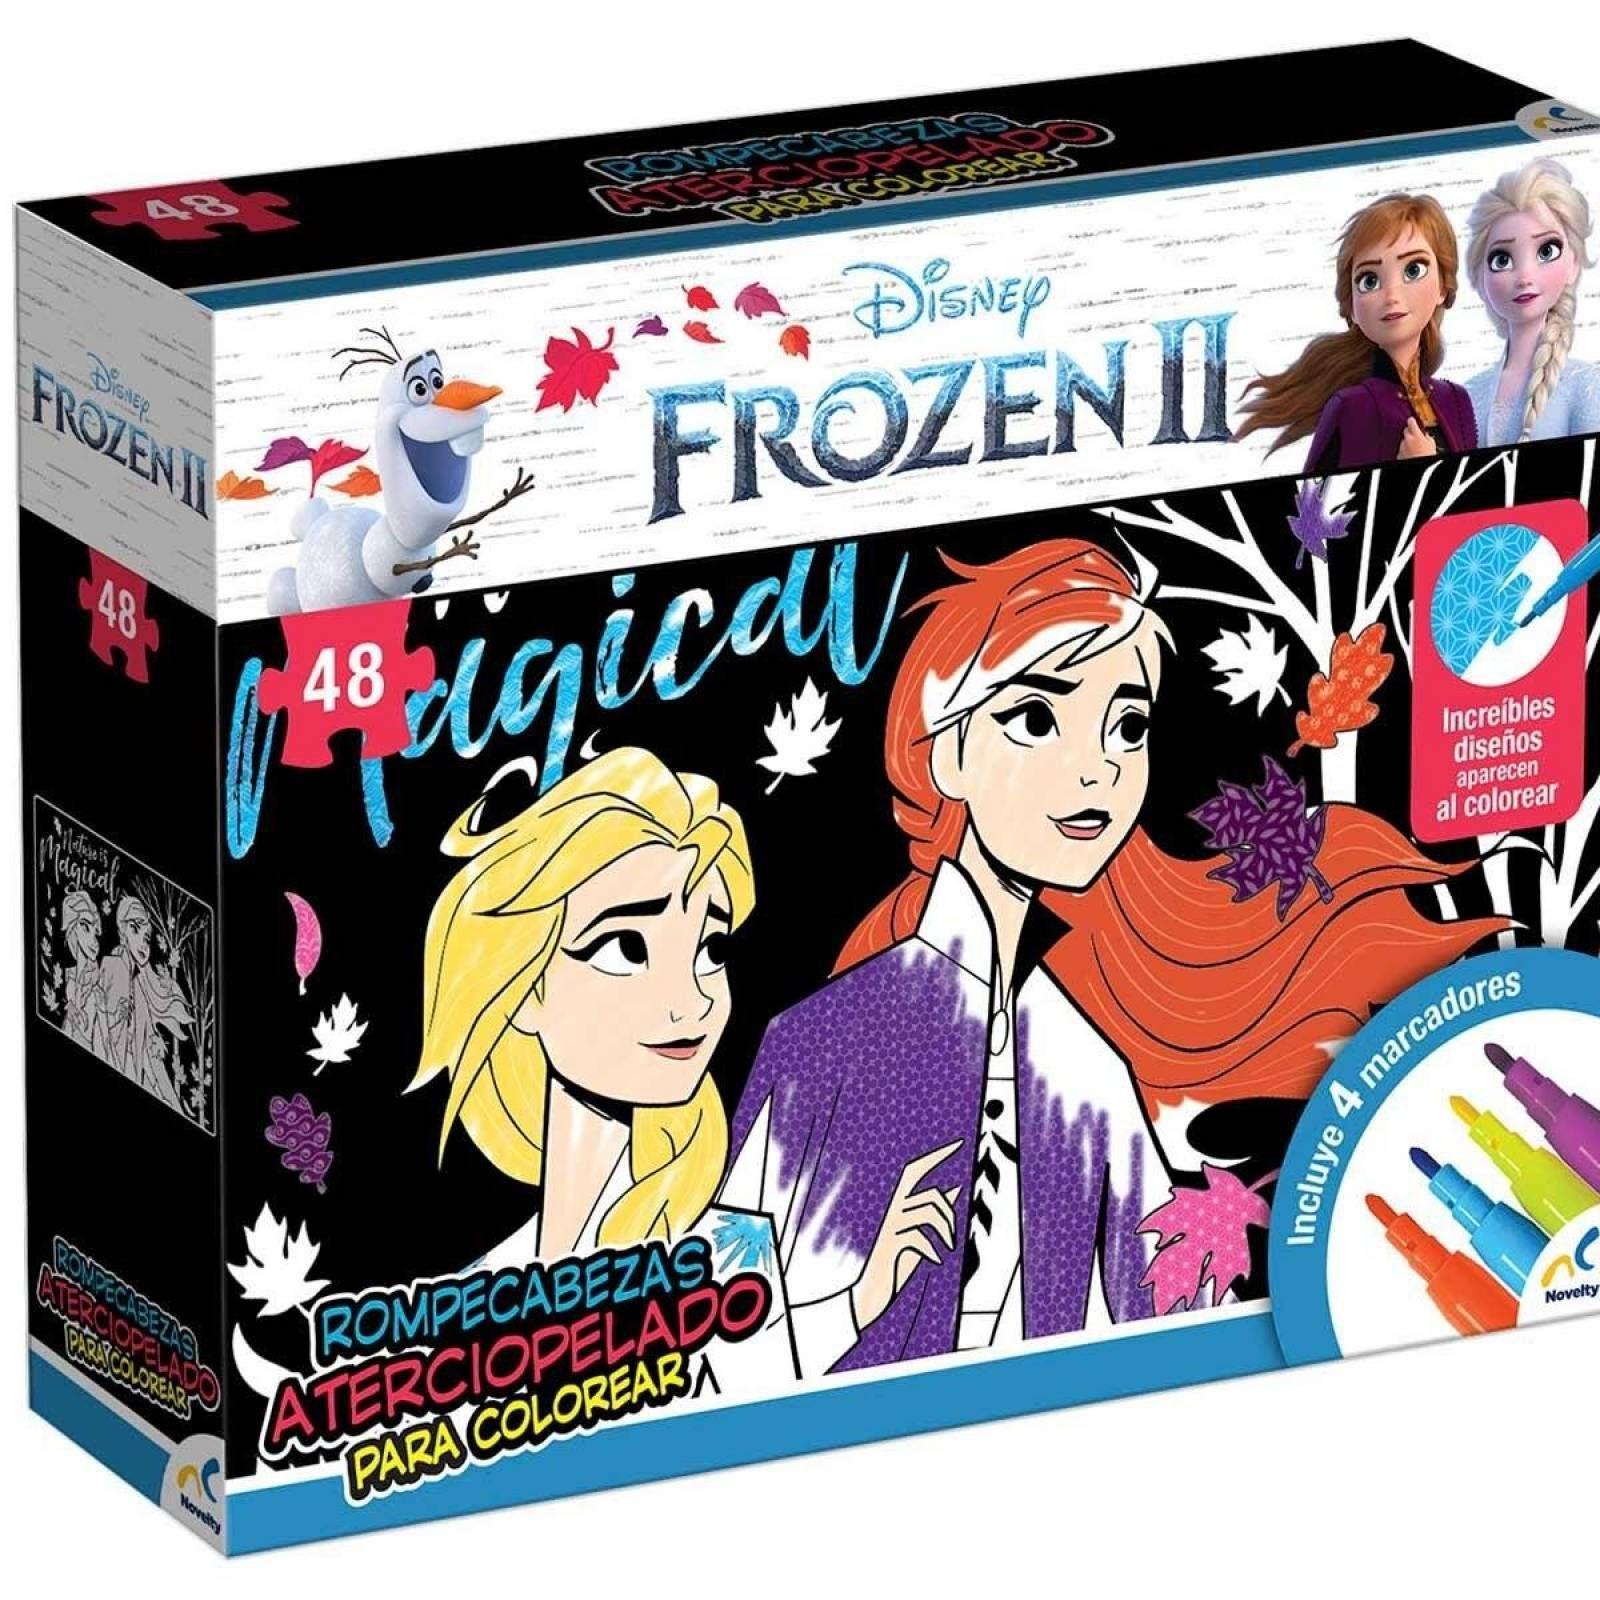 Rompecabezas aterciopelado para colorear Frozen II